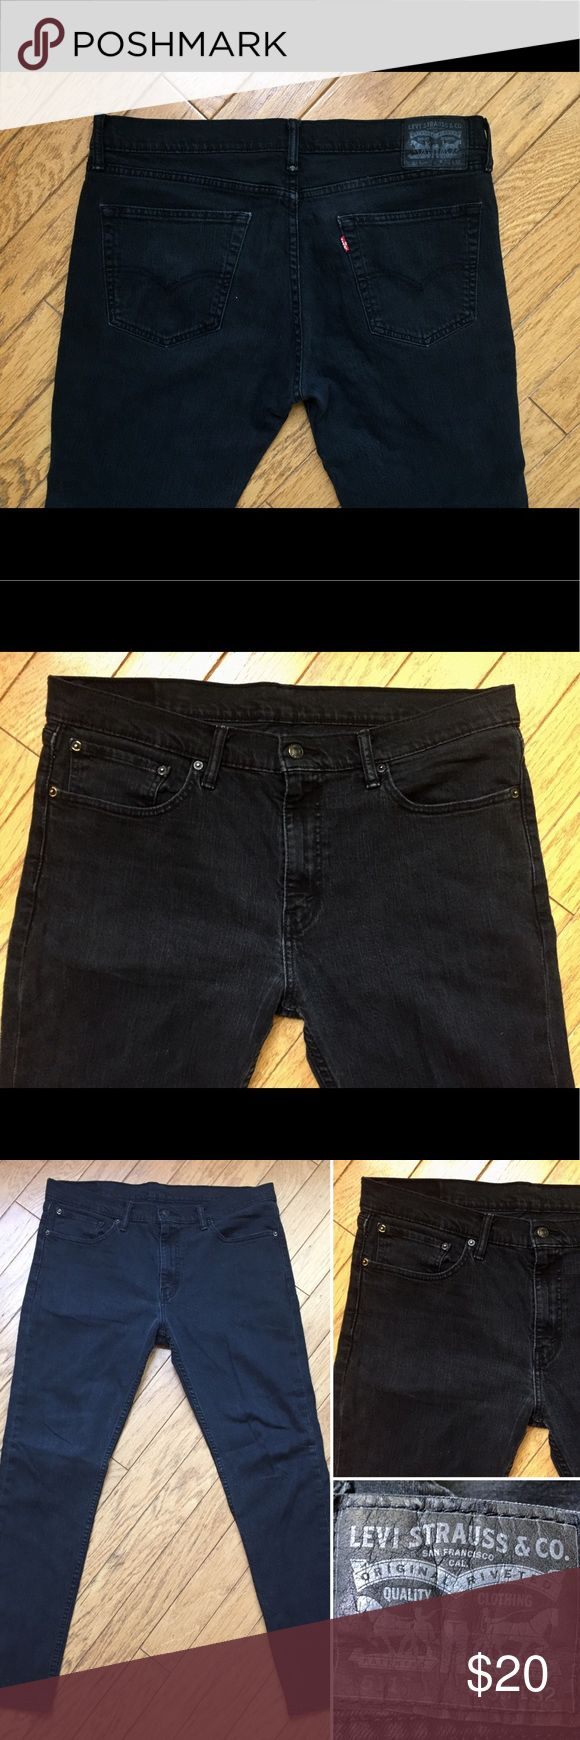 Levi's 511 Slim Fit Black Denim Men's Jeans Levi's 511 Slim Fit - men's regular size 36 waist x 32 inseam / length. Completely black denim jeans. Excellent condition, no flaws! JSYK - I discount all bundles ☺️ Prices negotiable, feel free to make an offer if you're interested. Levi's Jeans Slim